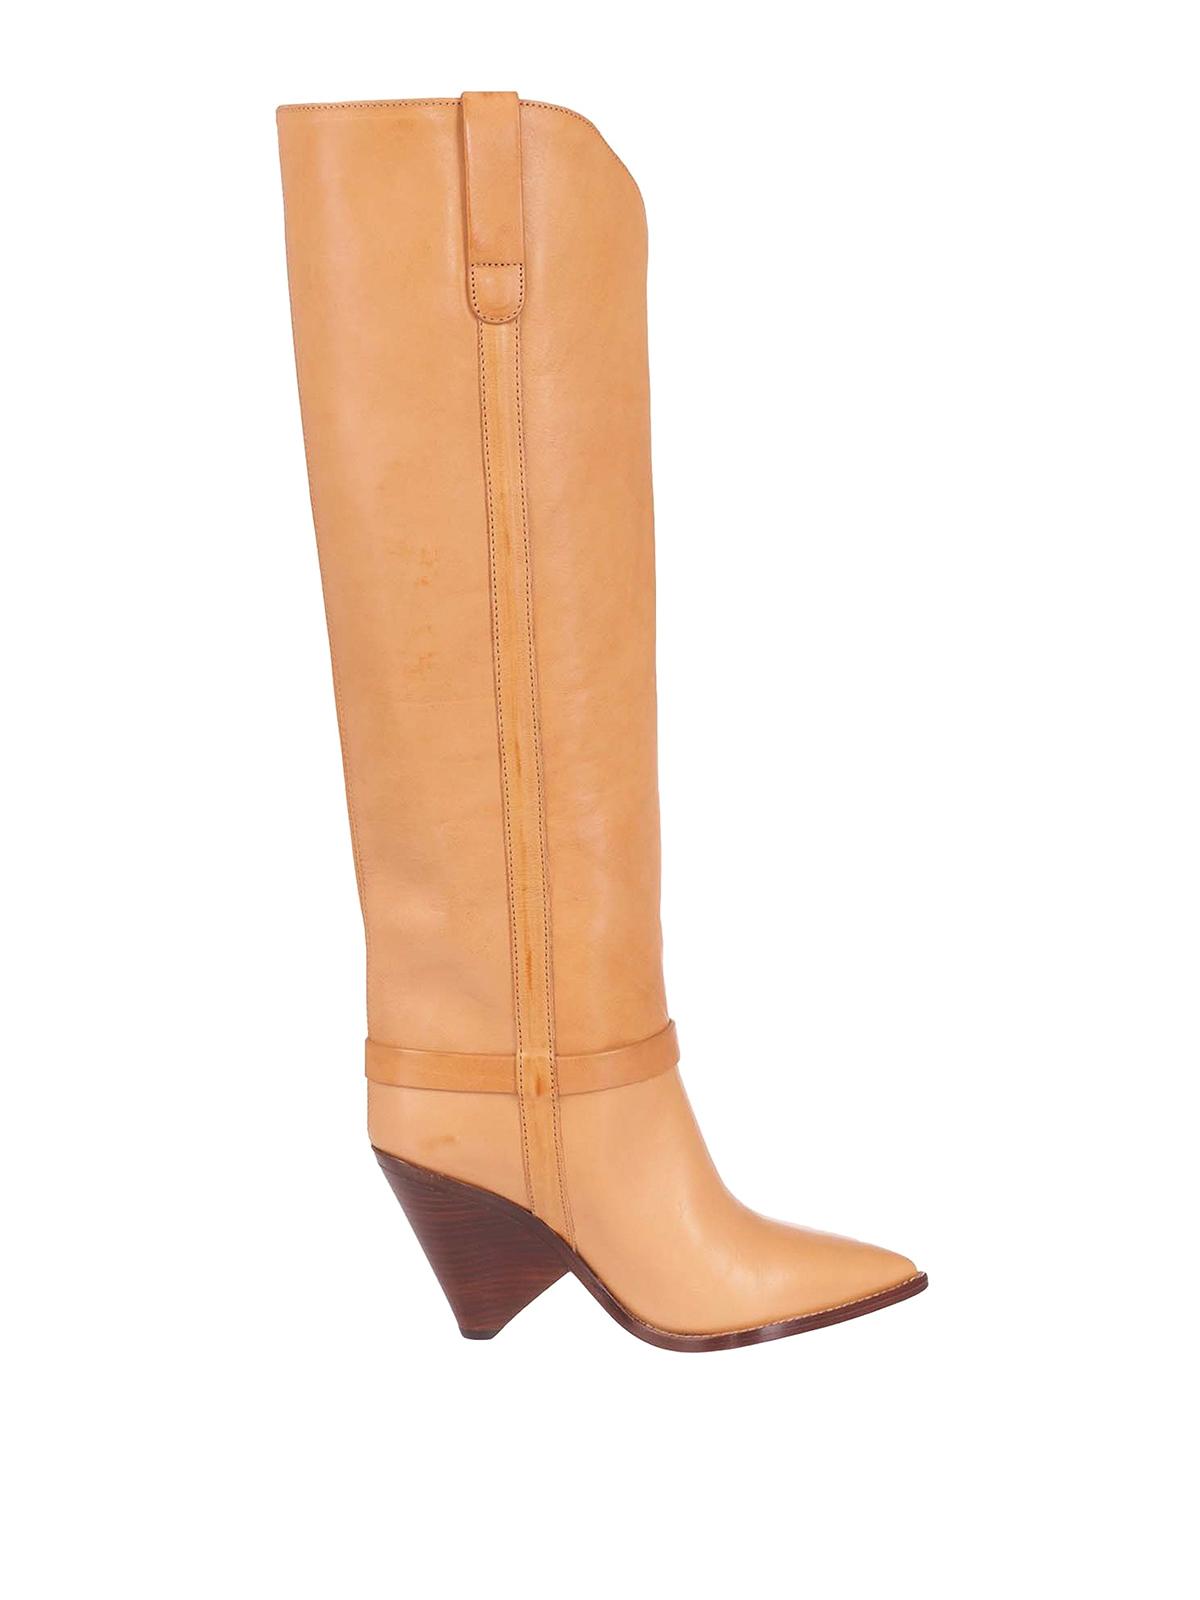 Isabel Marant Leathers LENSKEE BOOTS